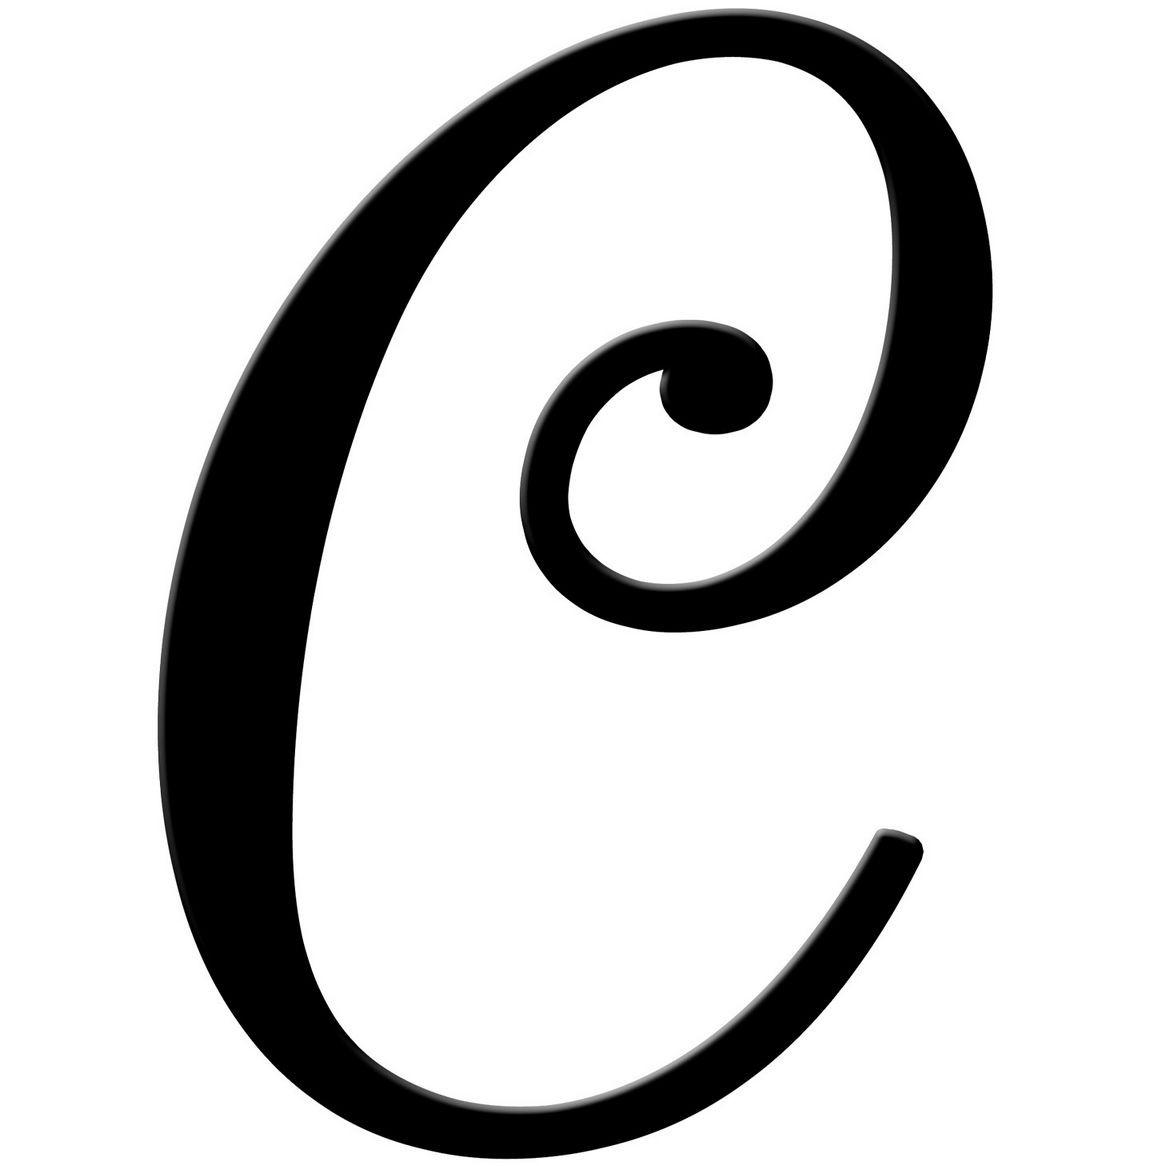 fancy letter c template  Resume Format: Letter C Fancy - fancy letter c template